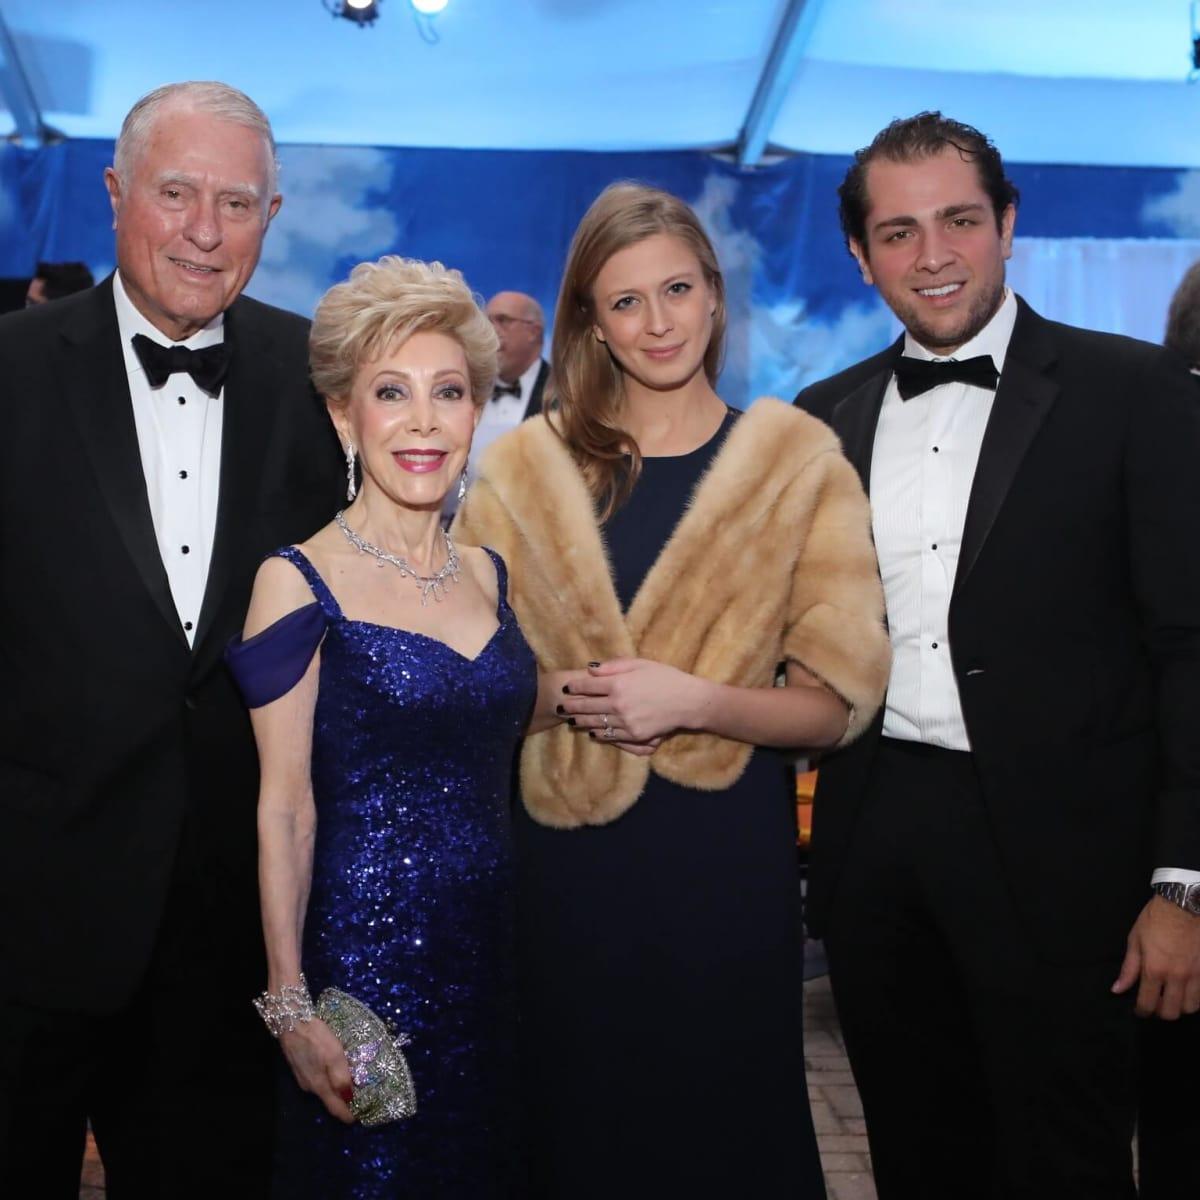 Jim Daniel, Margaret Alkek Williams, Princess Tatiana Galitzine, Guillermo Sierra at Houston Grand Opera opening night